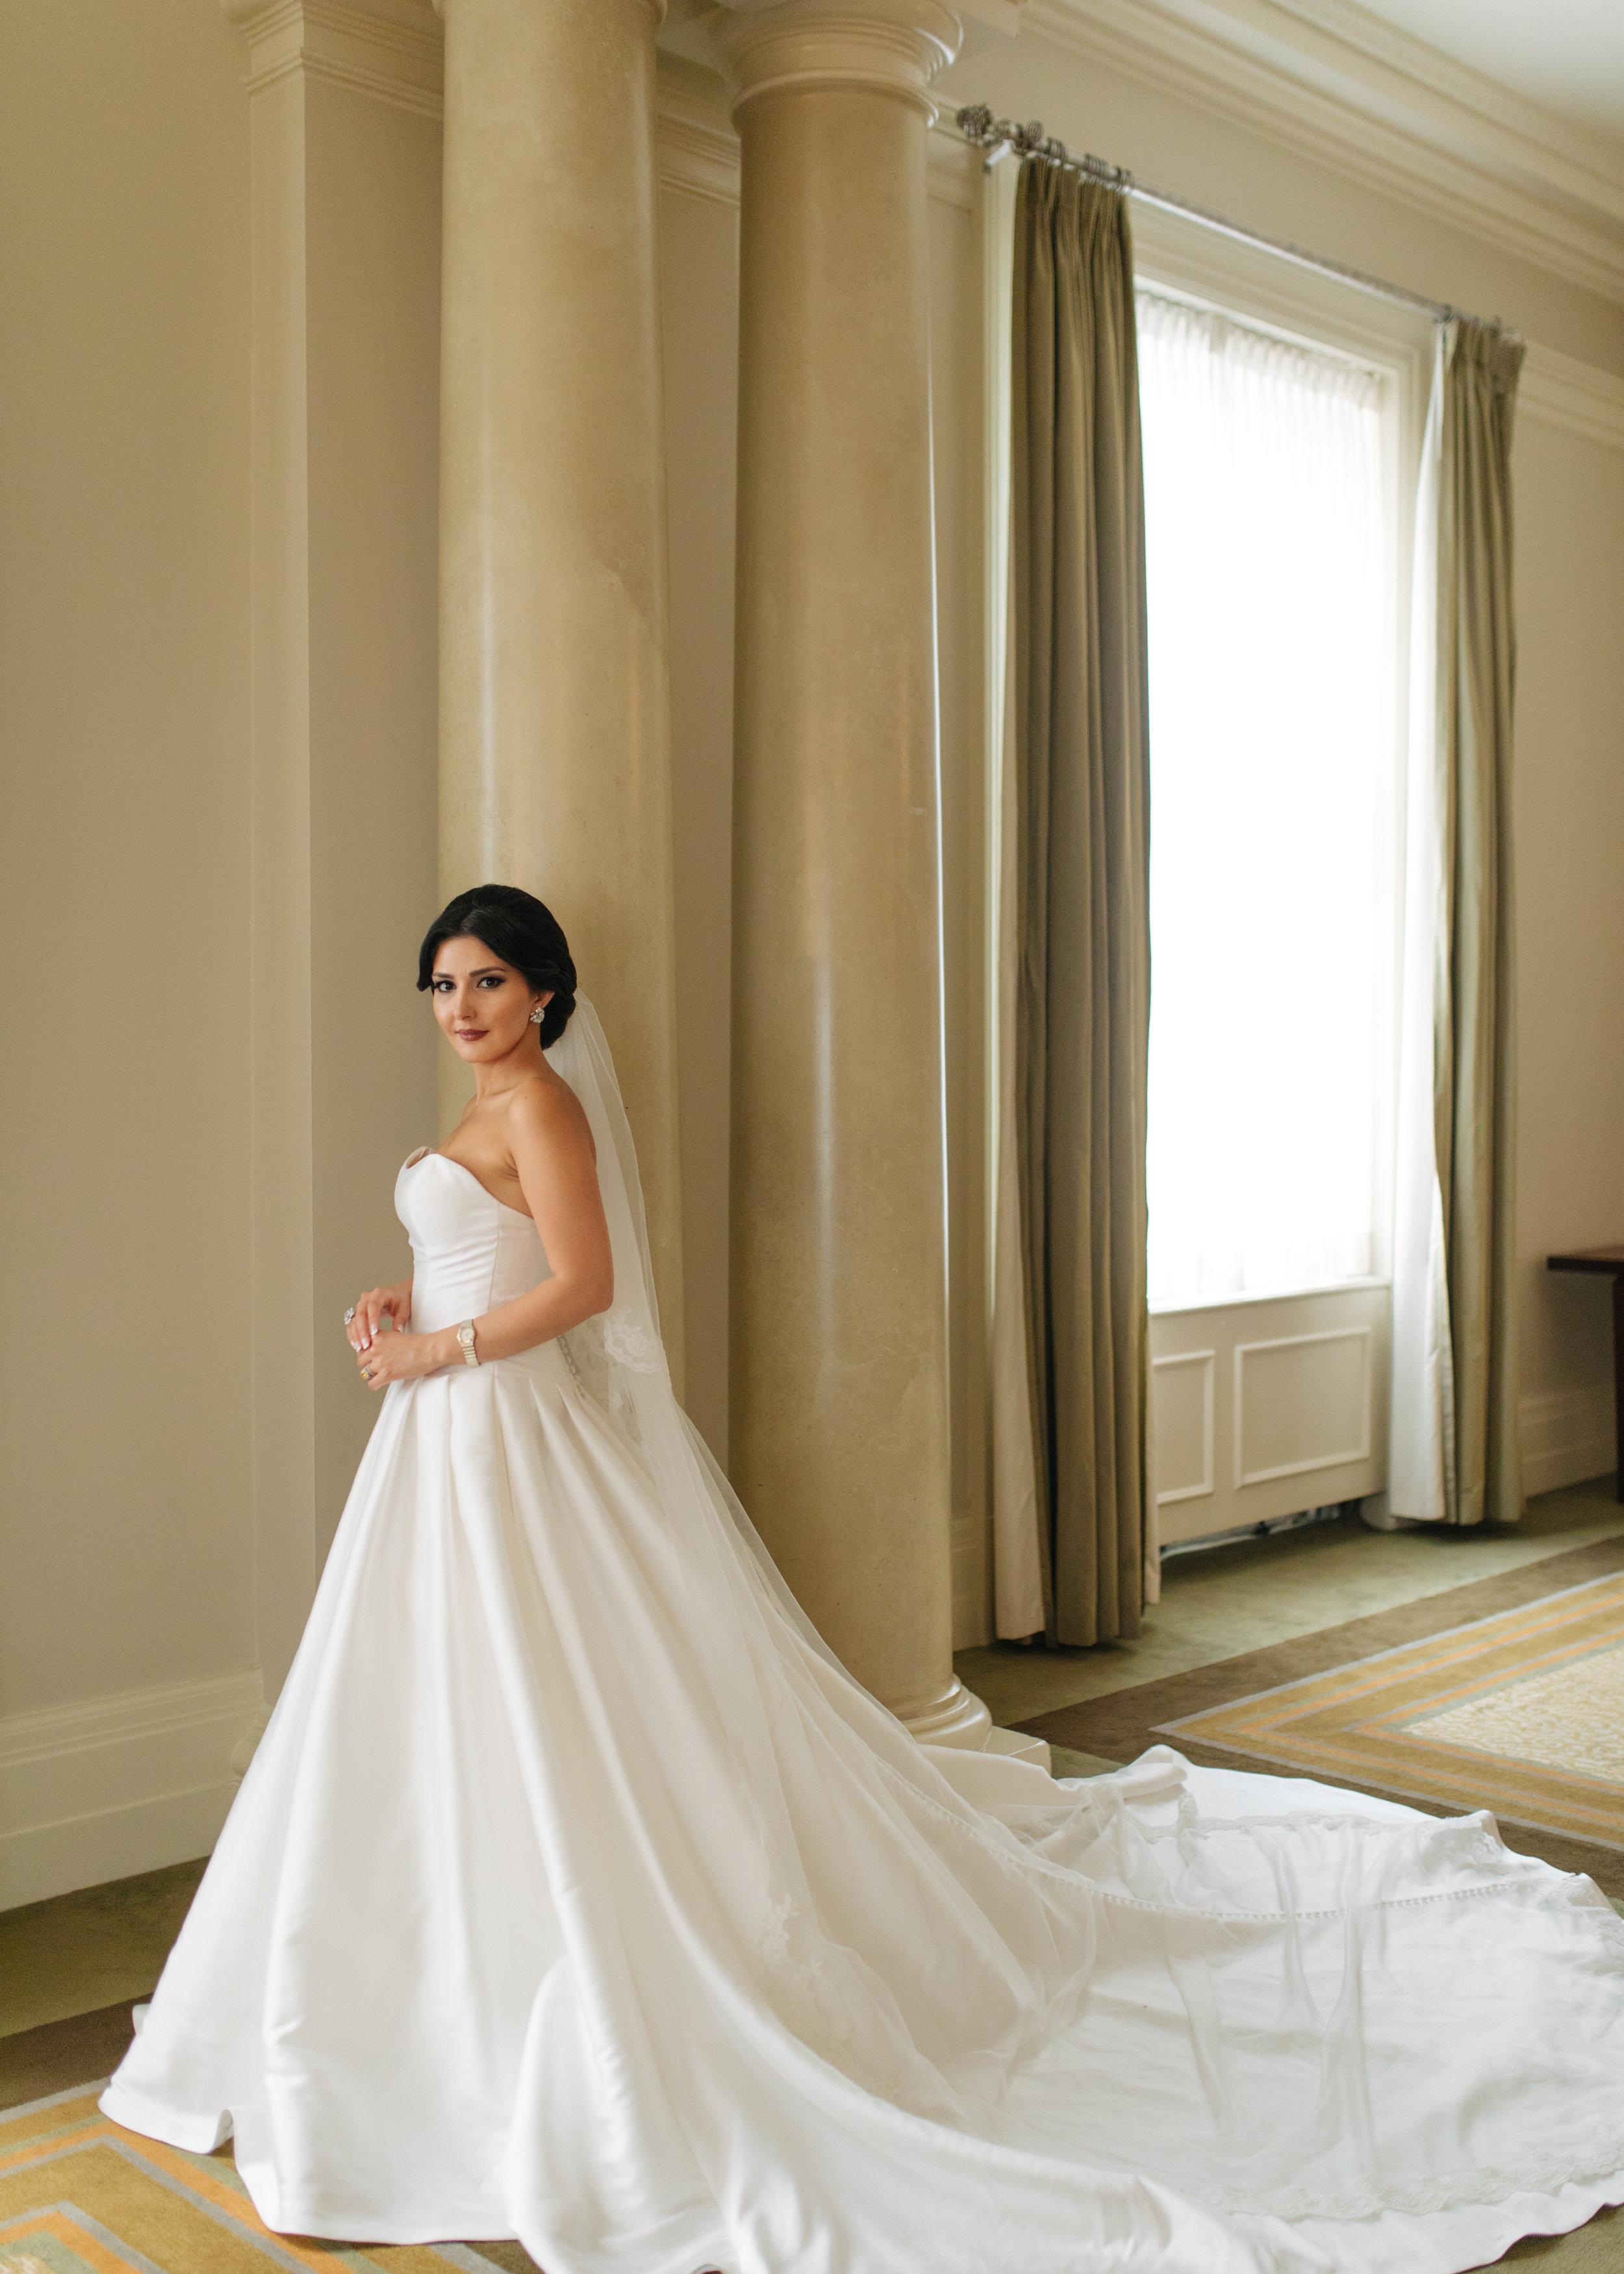 herastudios_wedding_mina_sina_hera_selects-44.jpg